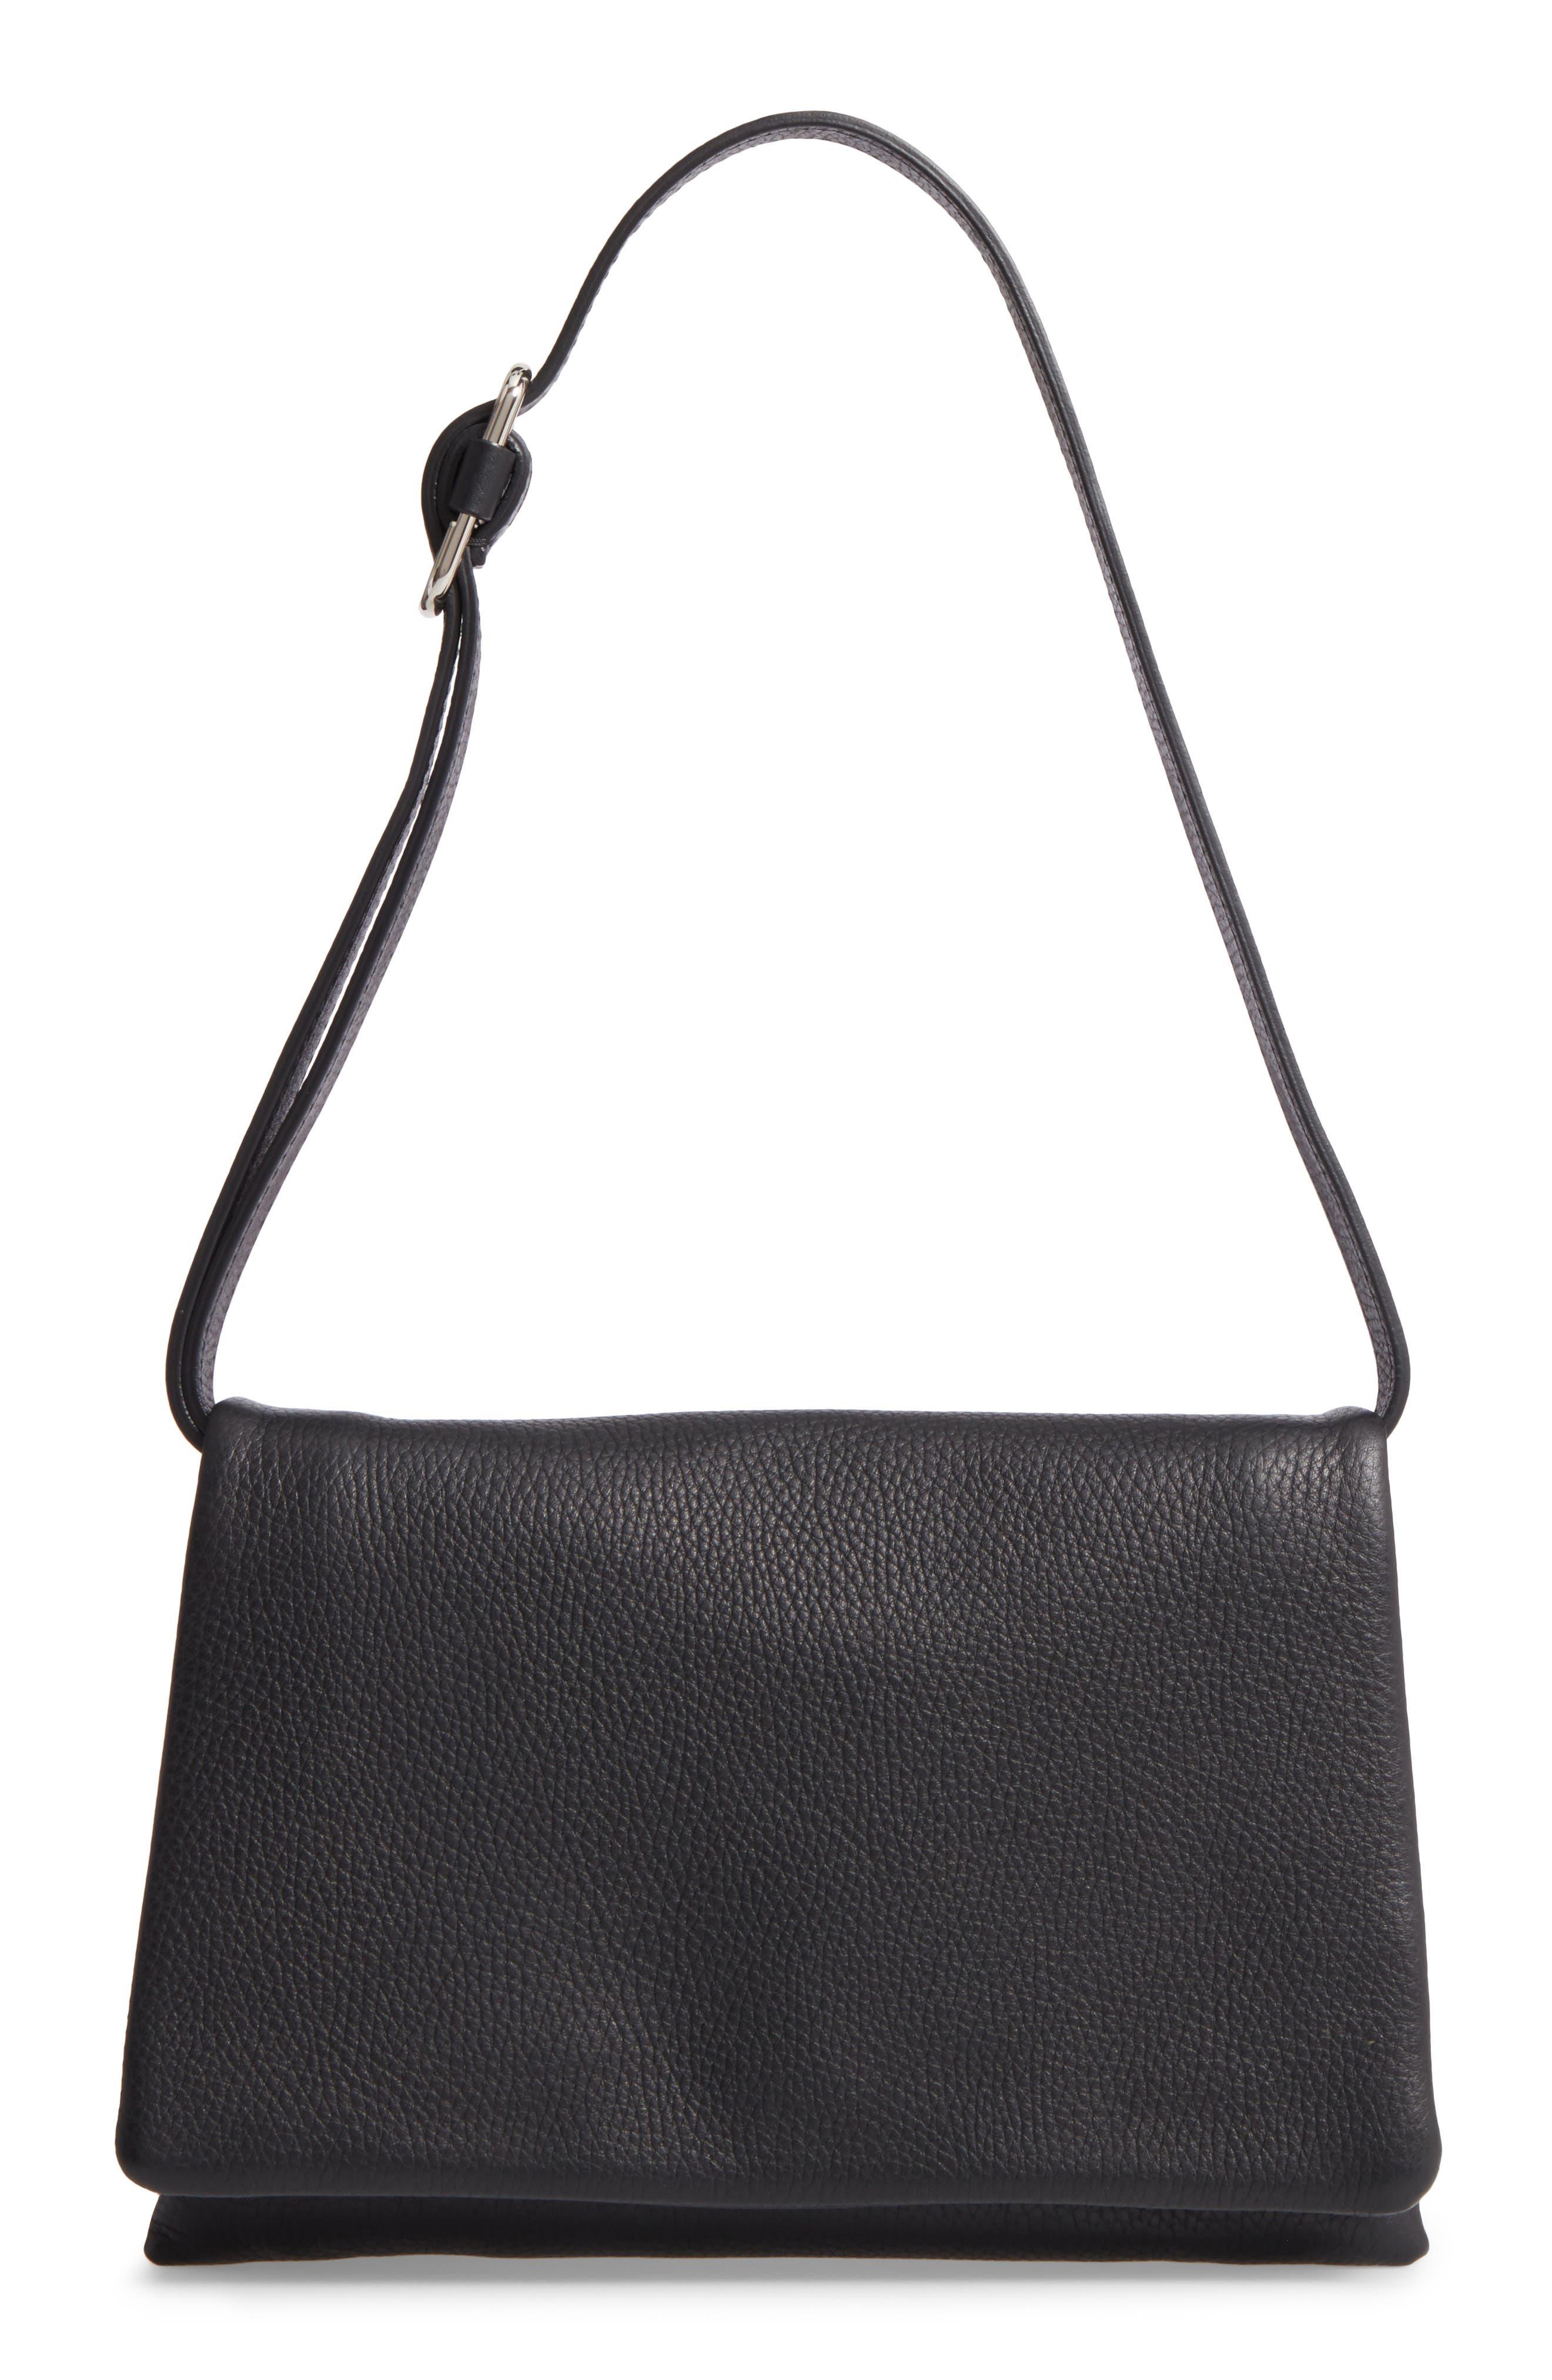 Alternate Image 1 Selected - Shinola Leather Convertible Shoulder Bag